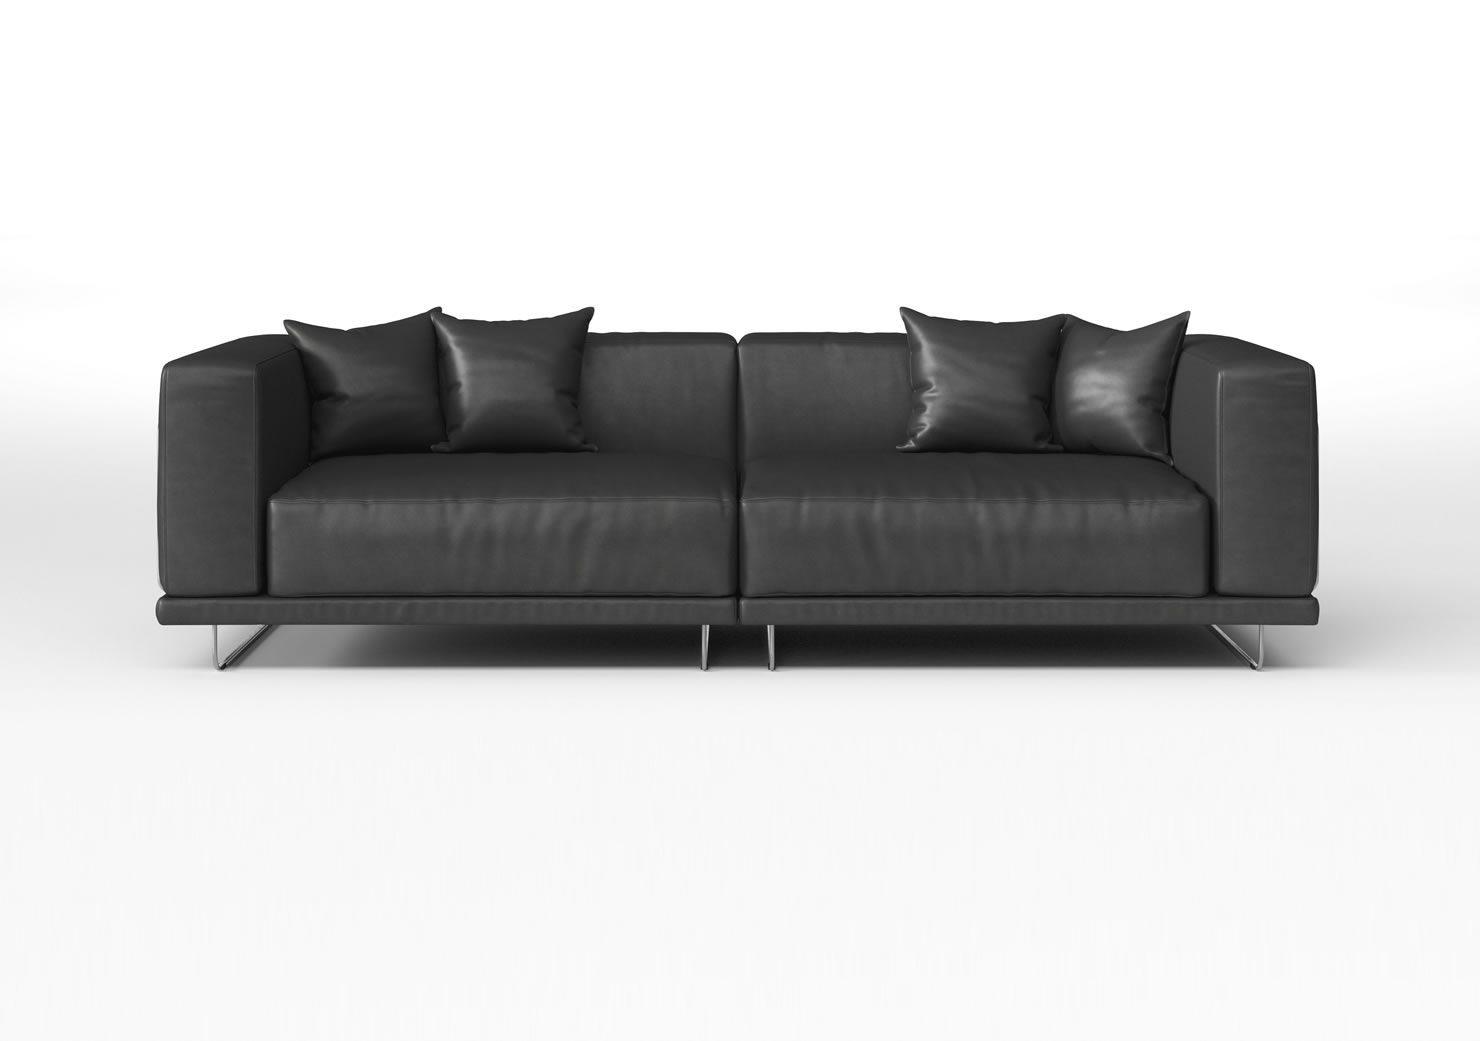 Avis du TYLOSAND d'IKEA | COMFORT WORKS